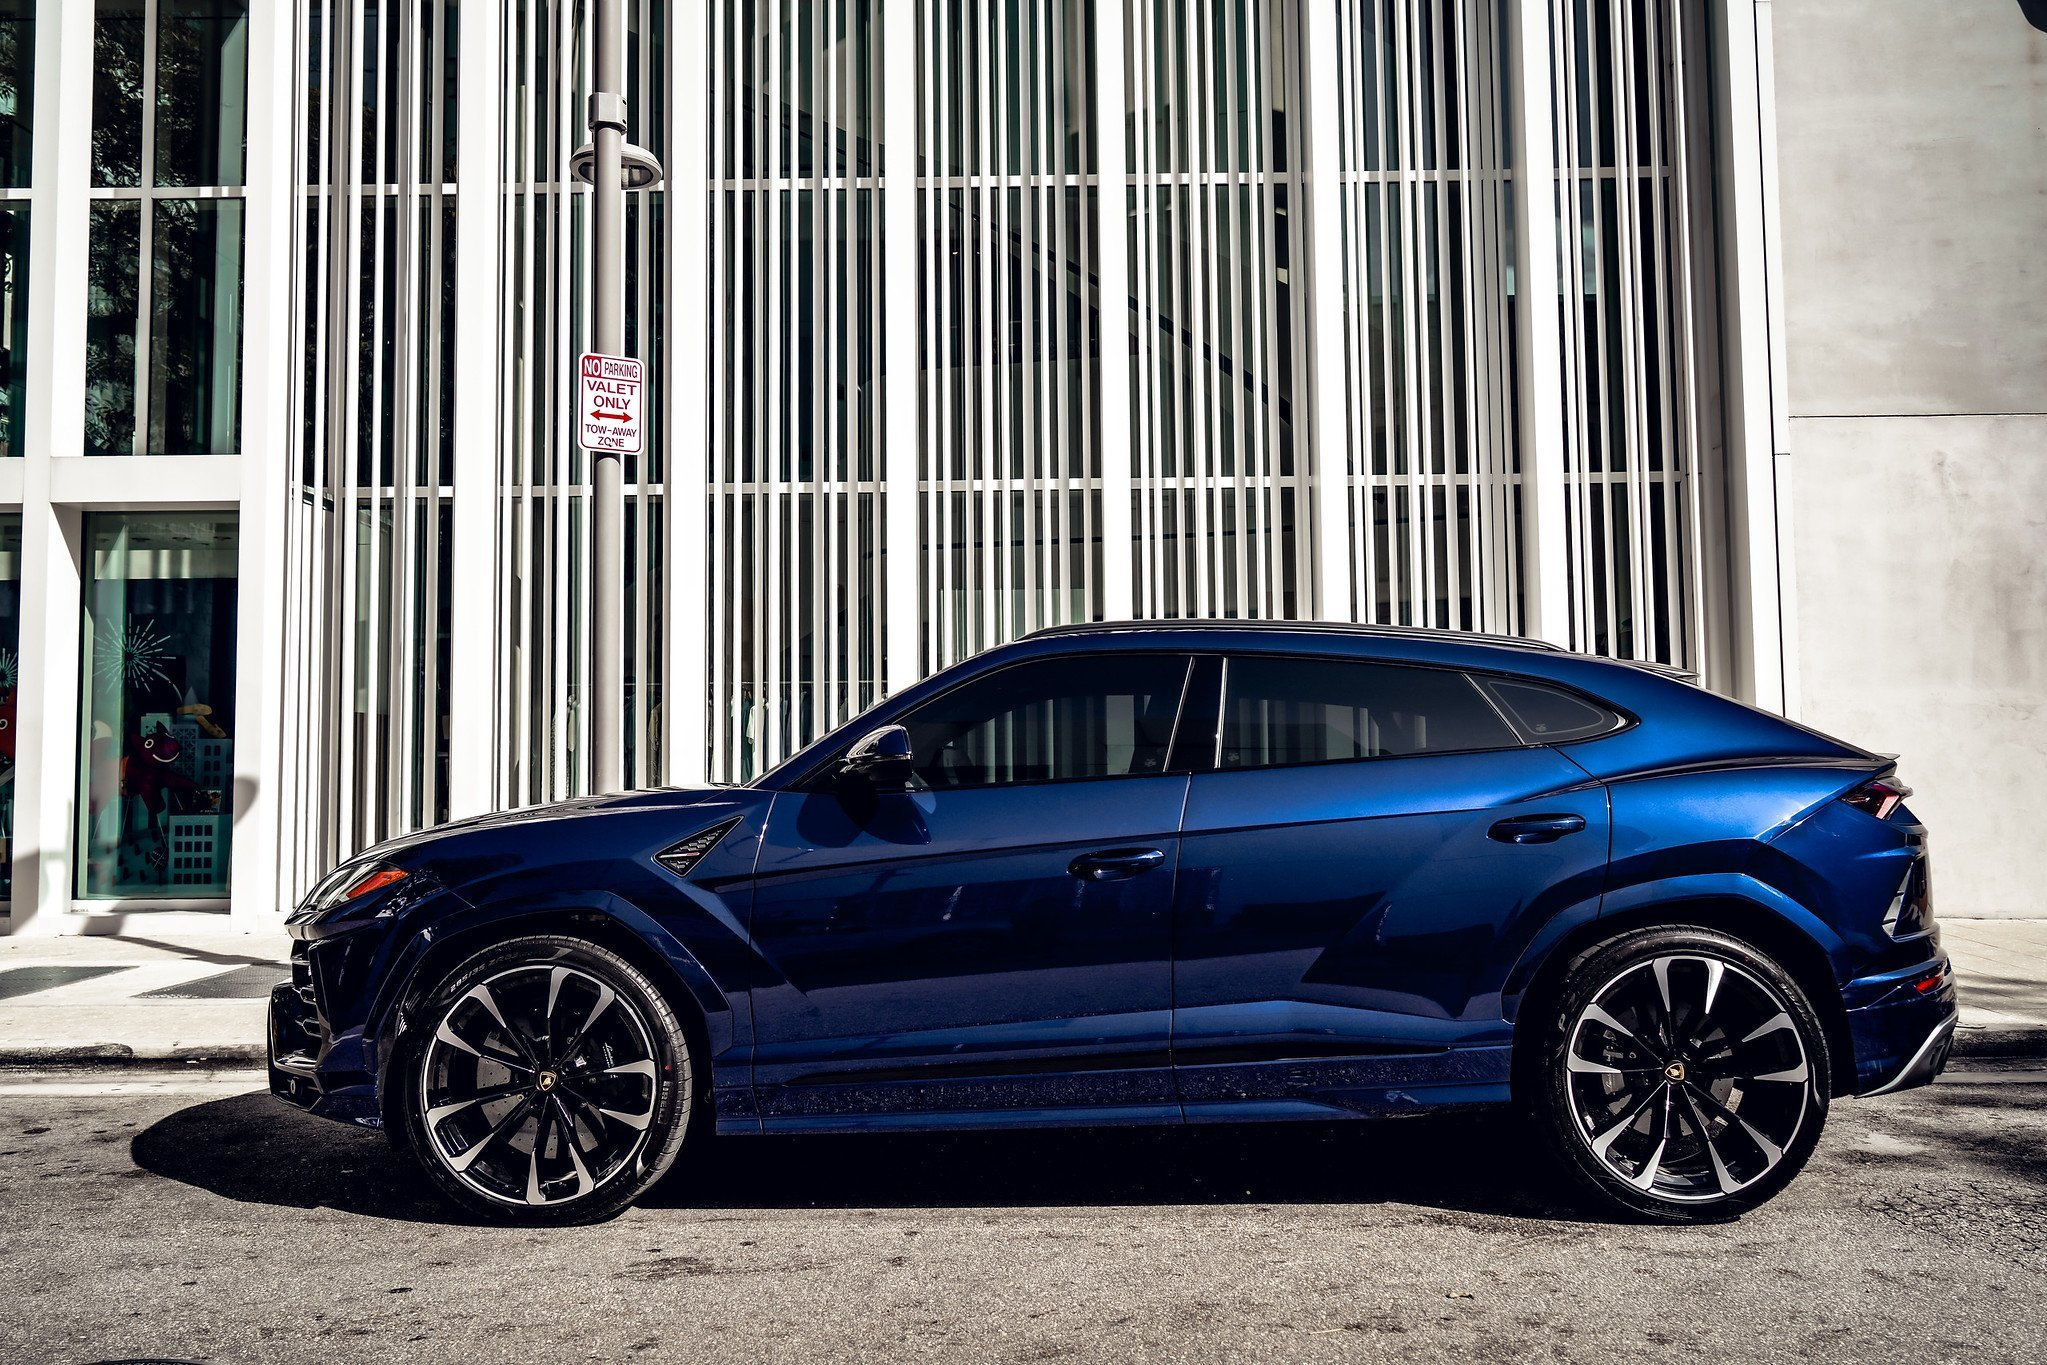 Image #7 of our  2021 Lamborghini Urus - Dark Blue    In Miami Fort Lauderdale Palm Beach South Florida